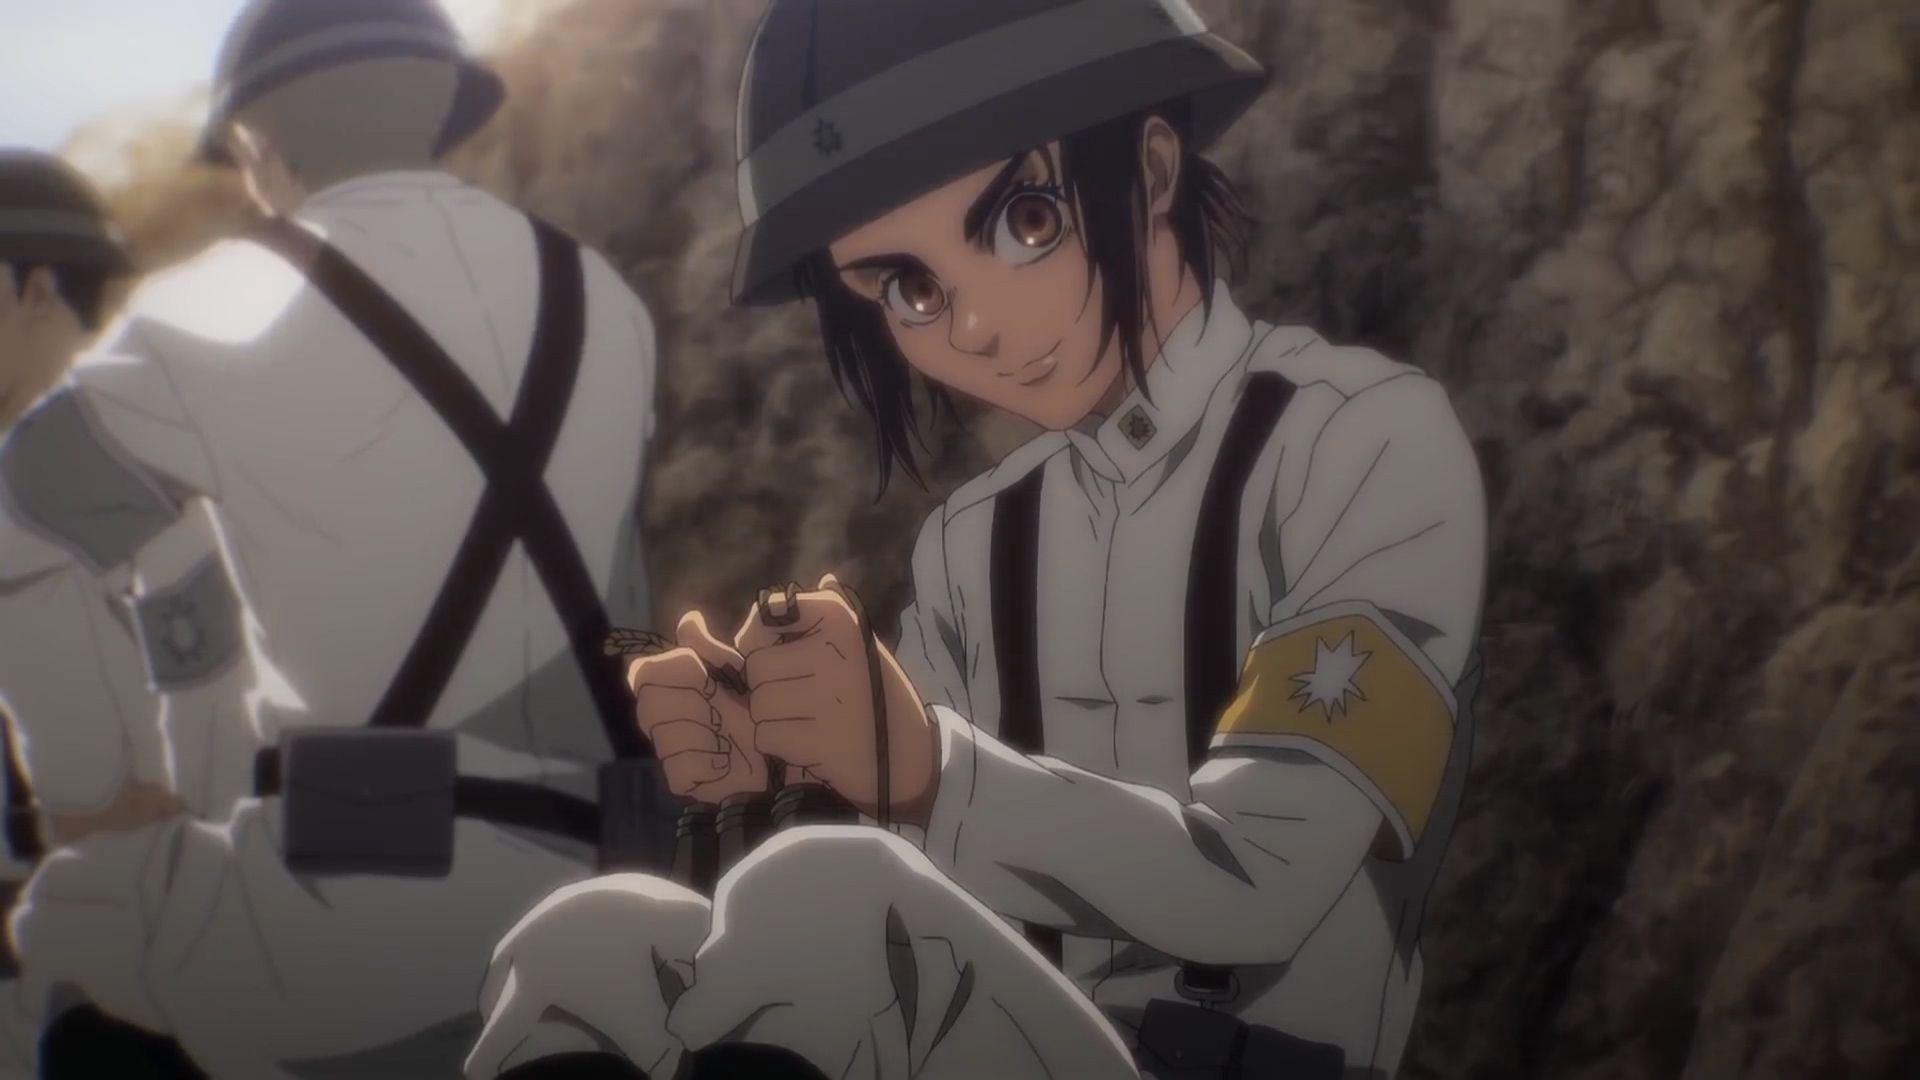 jujutsu kaisen anime episodes release date